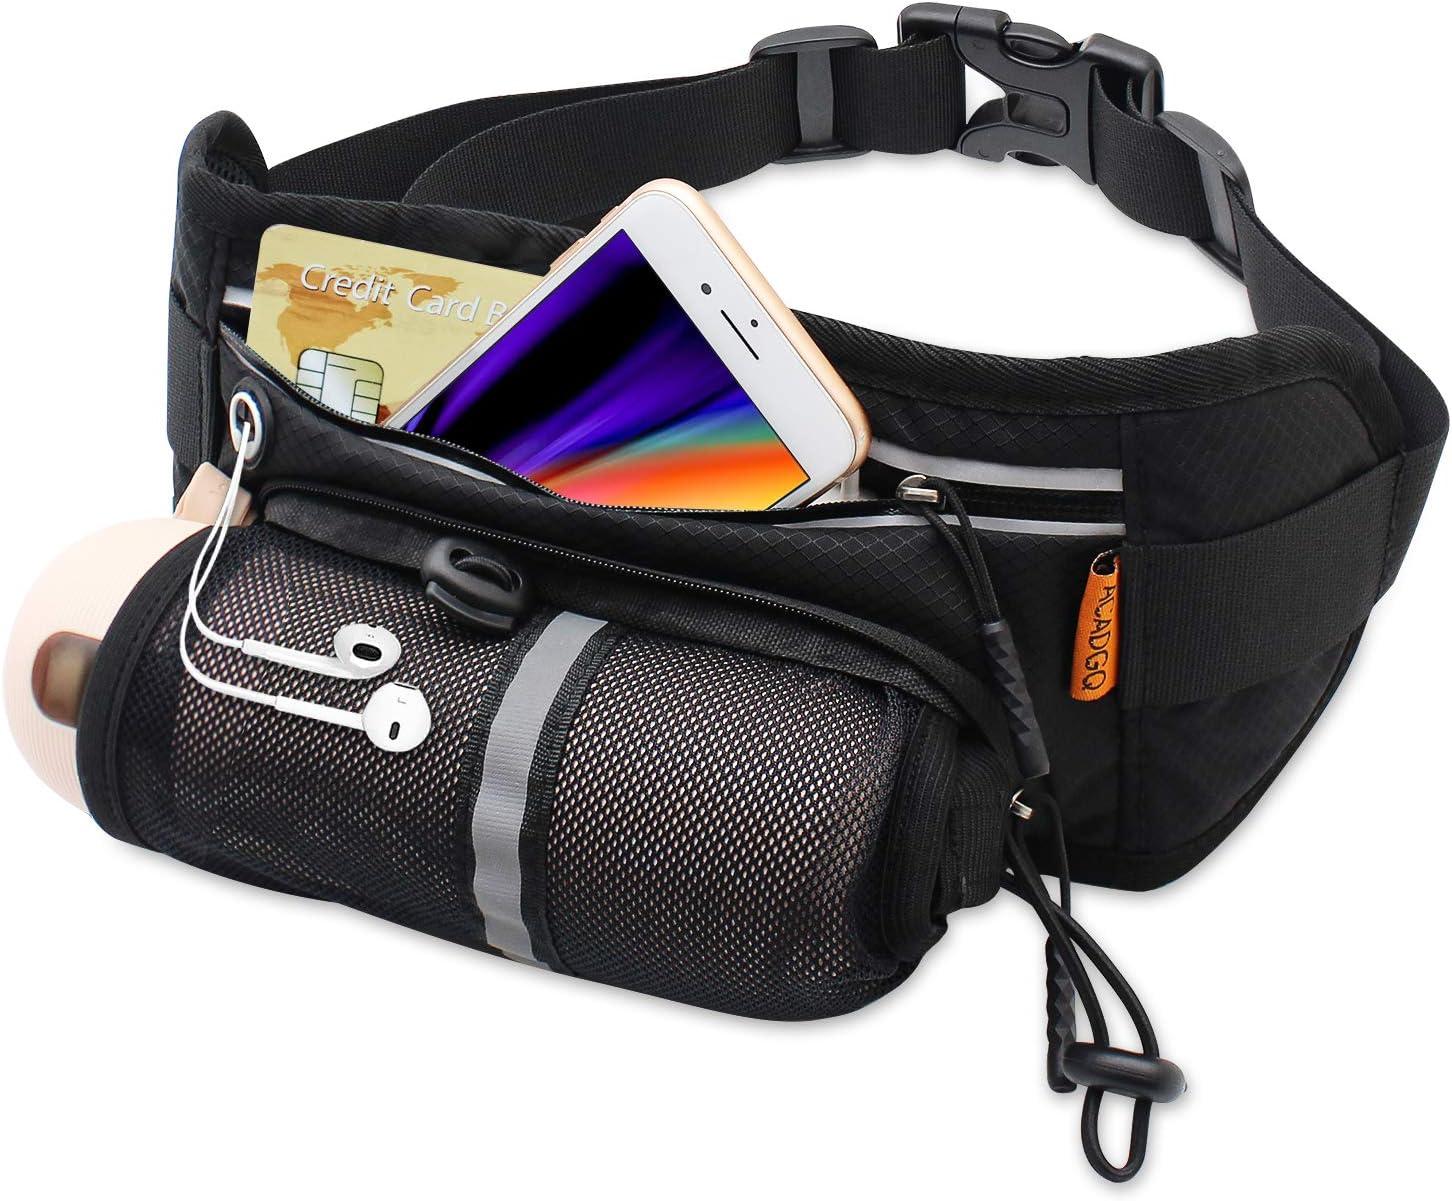 ACADGQ Fanny Pack for Women and Men Waterproof Running Belt Waist Pack with Water Bottle Holder-Black